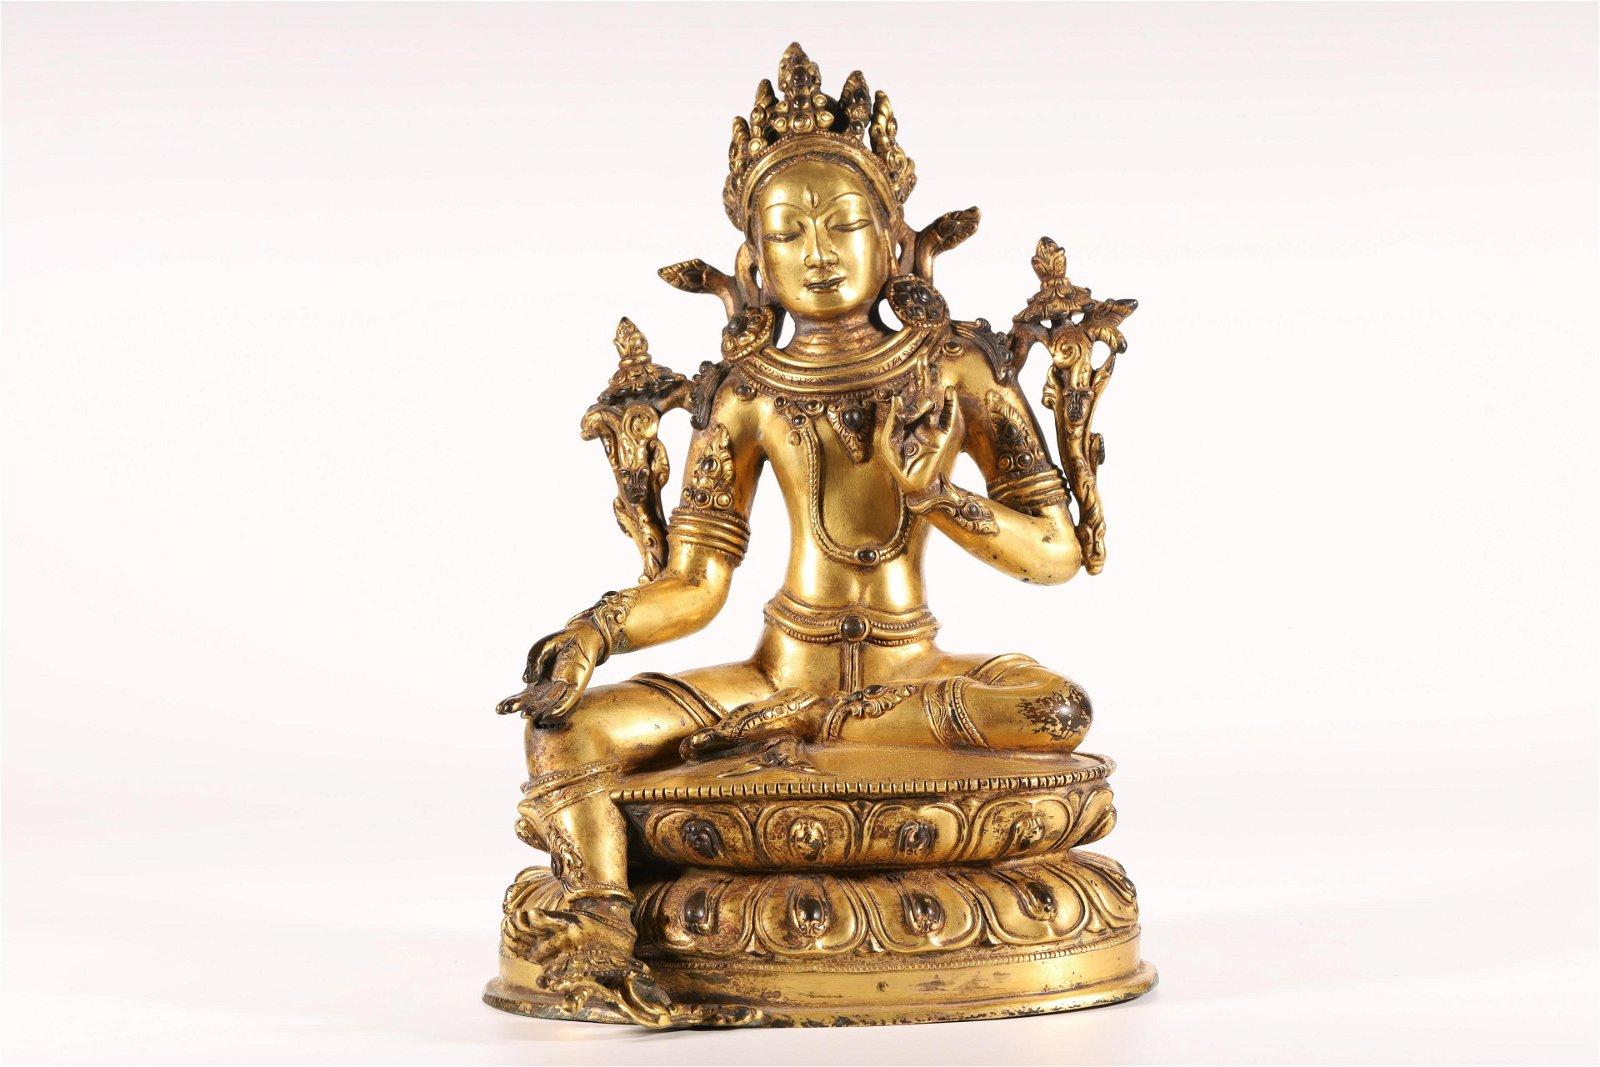 A Fine and Rare Gilt-Bronze Figure of Guanyin